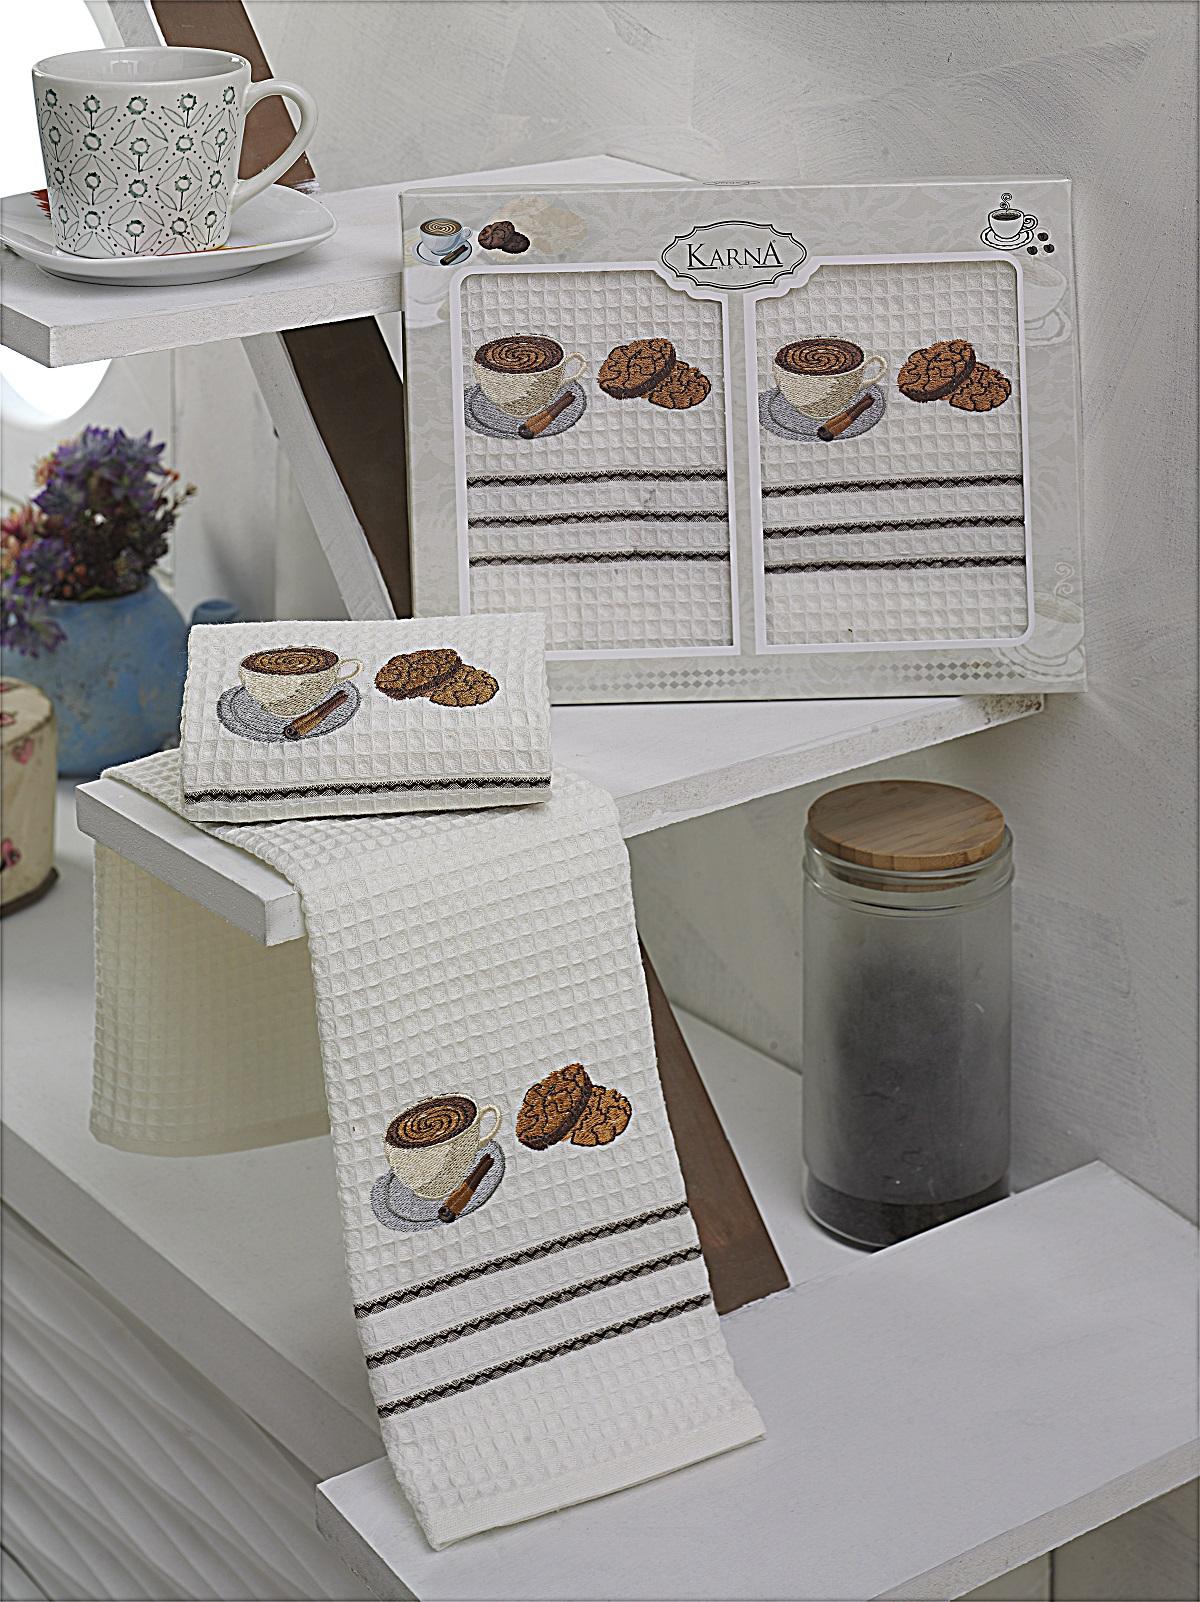 {} Karna Кухонное полотенце Votre V2 (40х60 см - 2 шт) bon appetit кухонное полотенце cake цвет голубой 40х60 см 2 шт